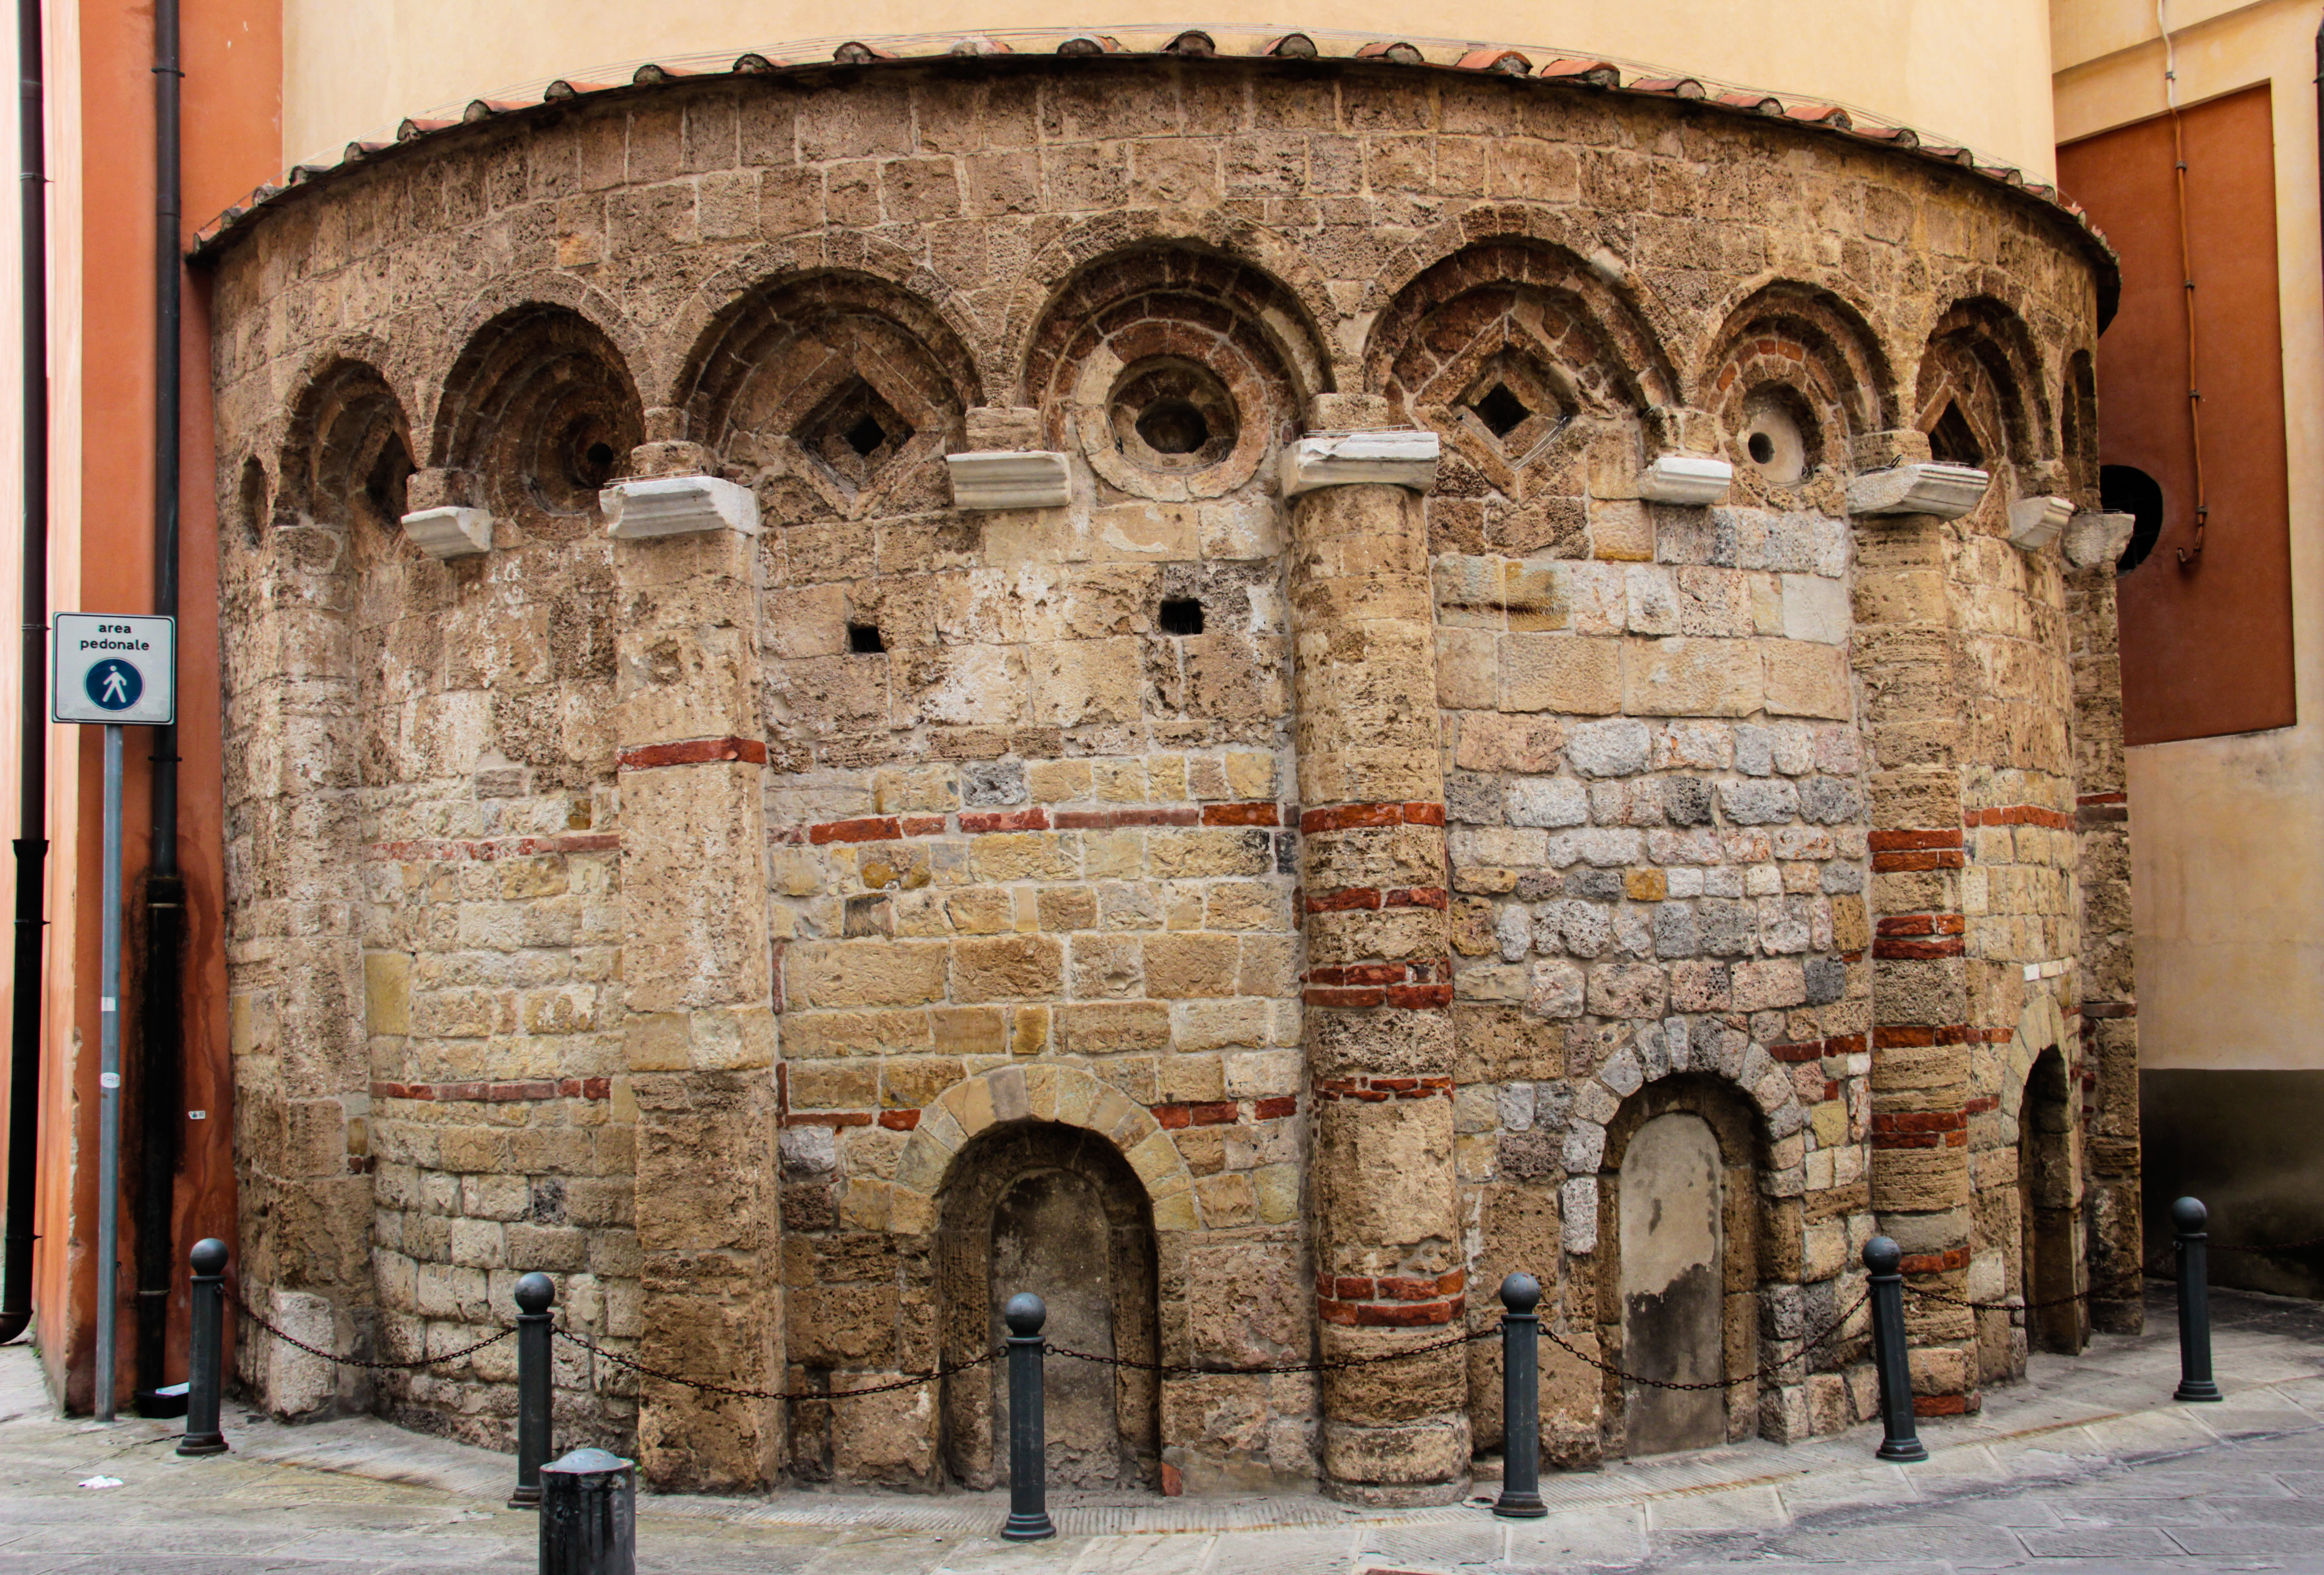 Abside - Chiesa di Santa Cristina (G. Bettini, Comune di Pisa)